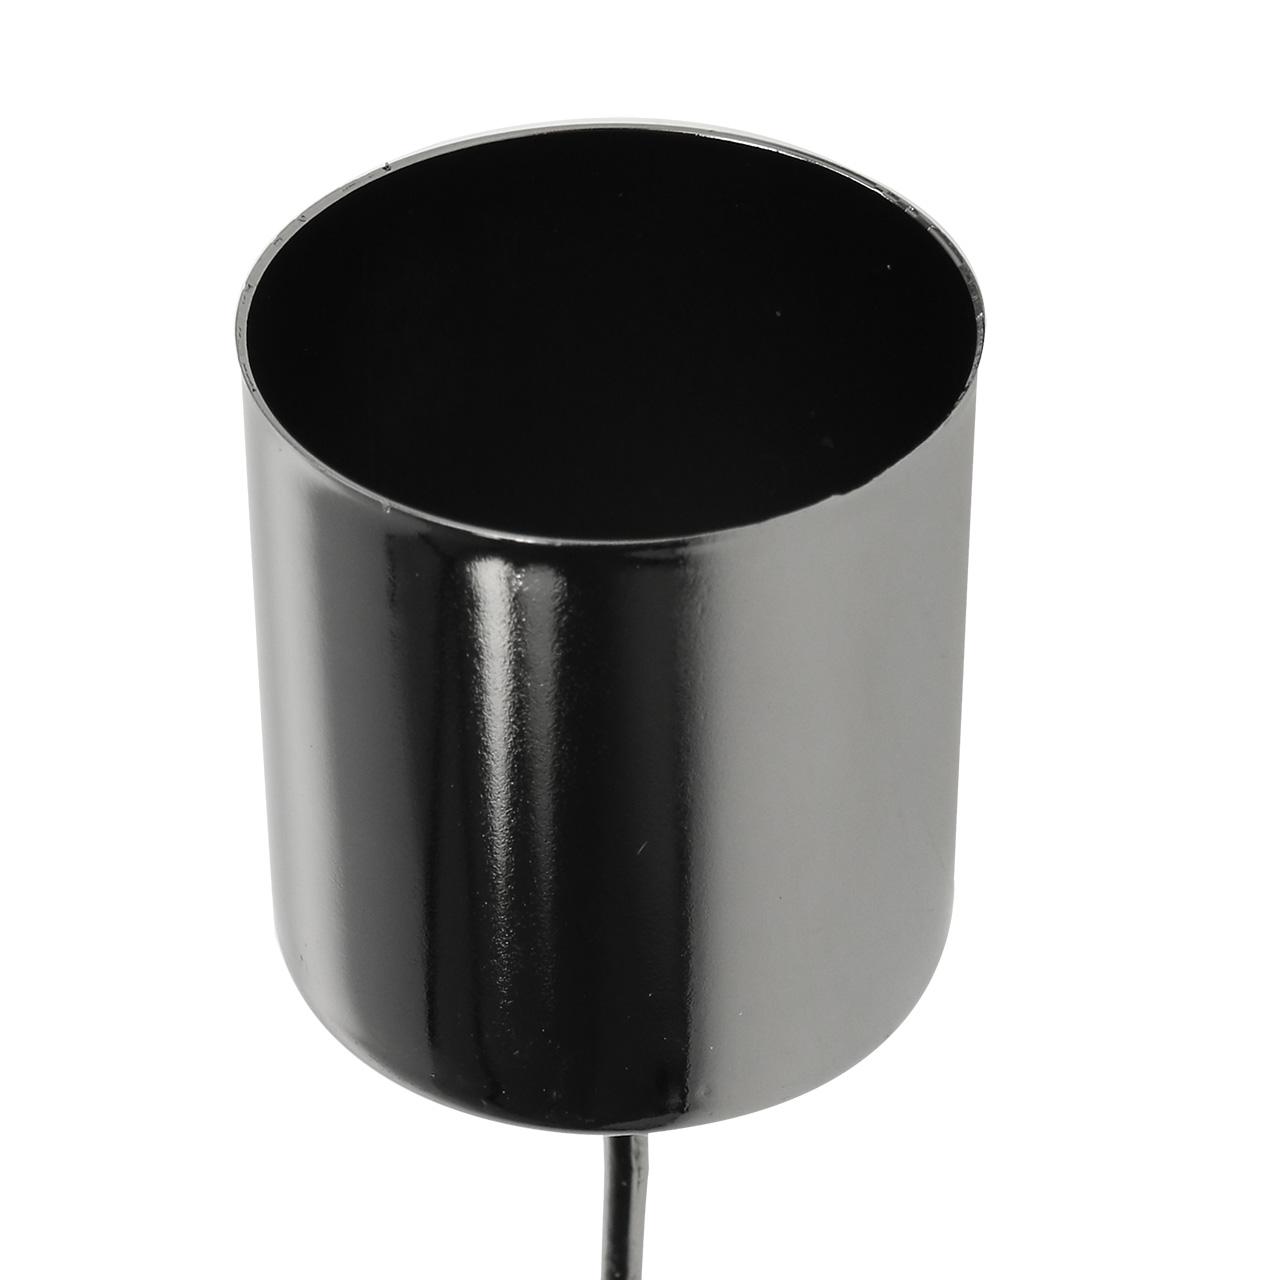 kerzenhalter anthrazit f r stabkerzen 3 5cm h4cm 4st. Black Bedroom Furniture Sets. Home Design Ideas